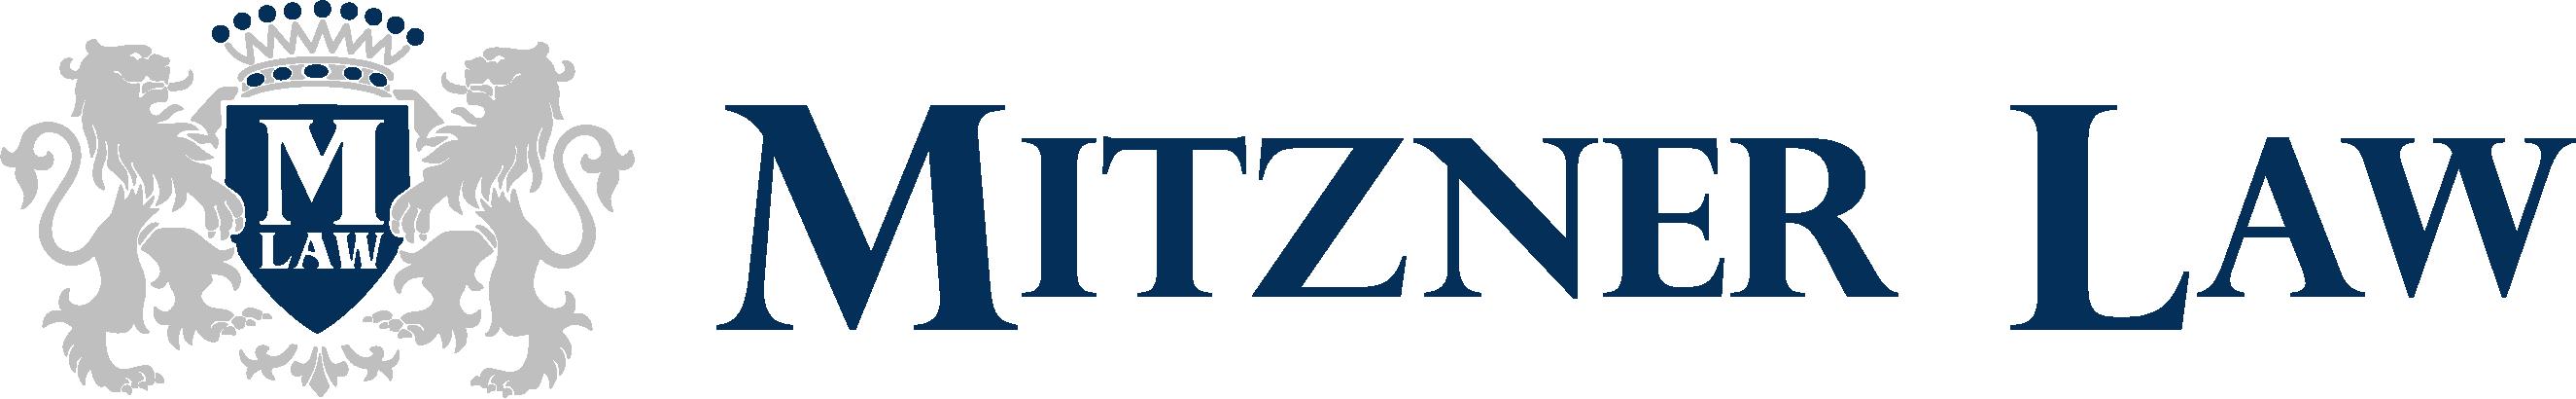 Mitzner Law